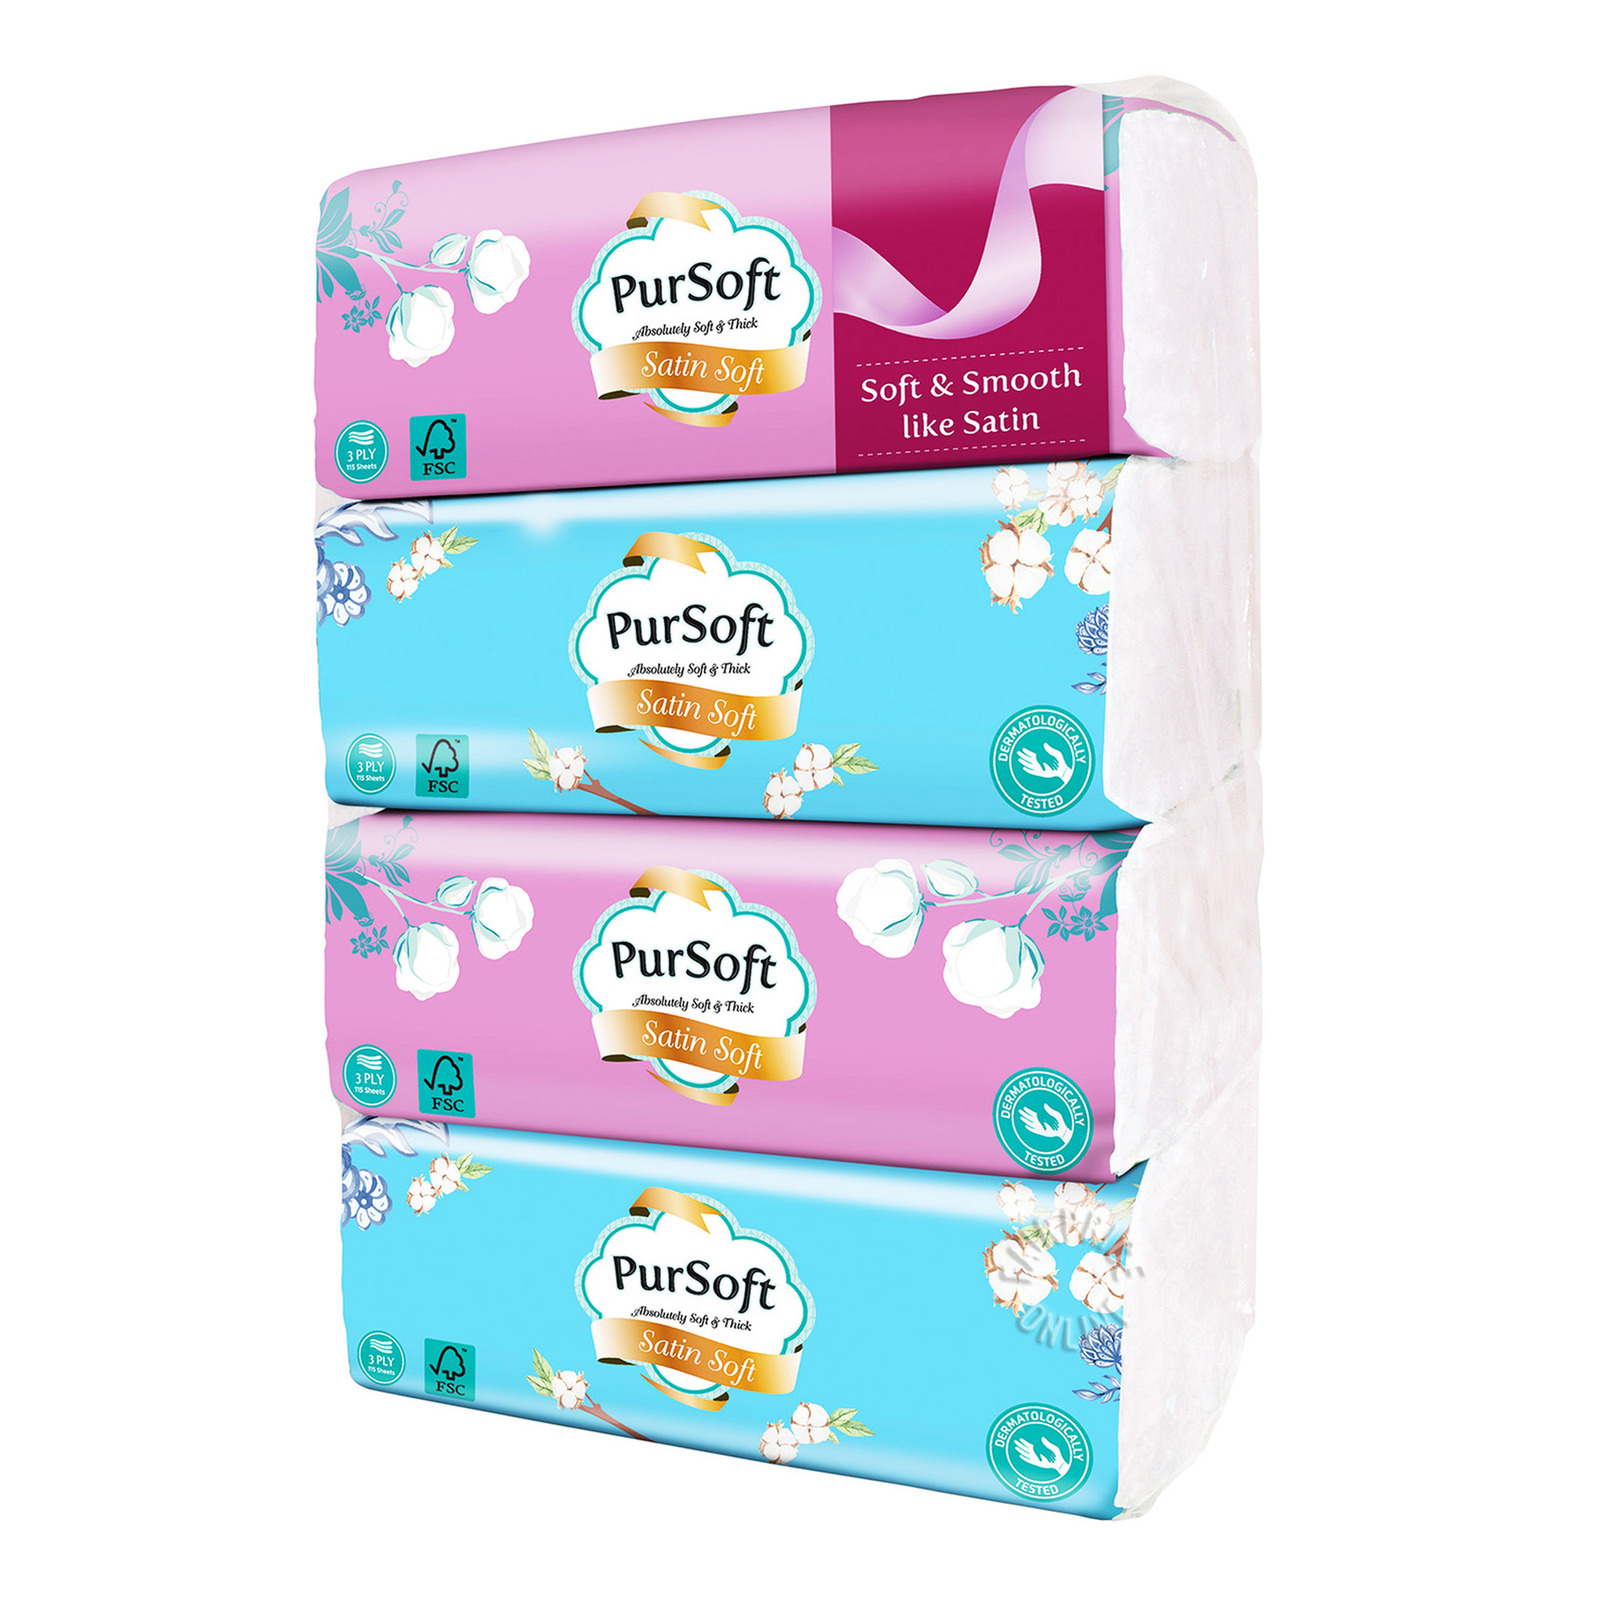 PurSoft Tissue Soft Pack - Satin Soft (3ply)